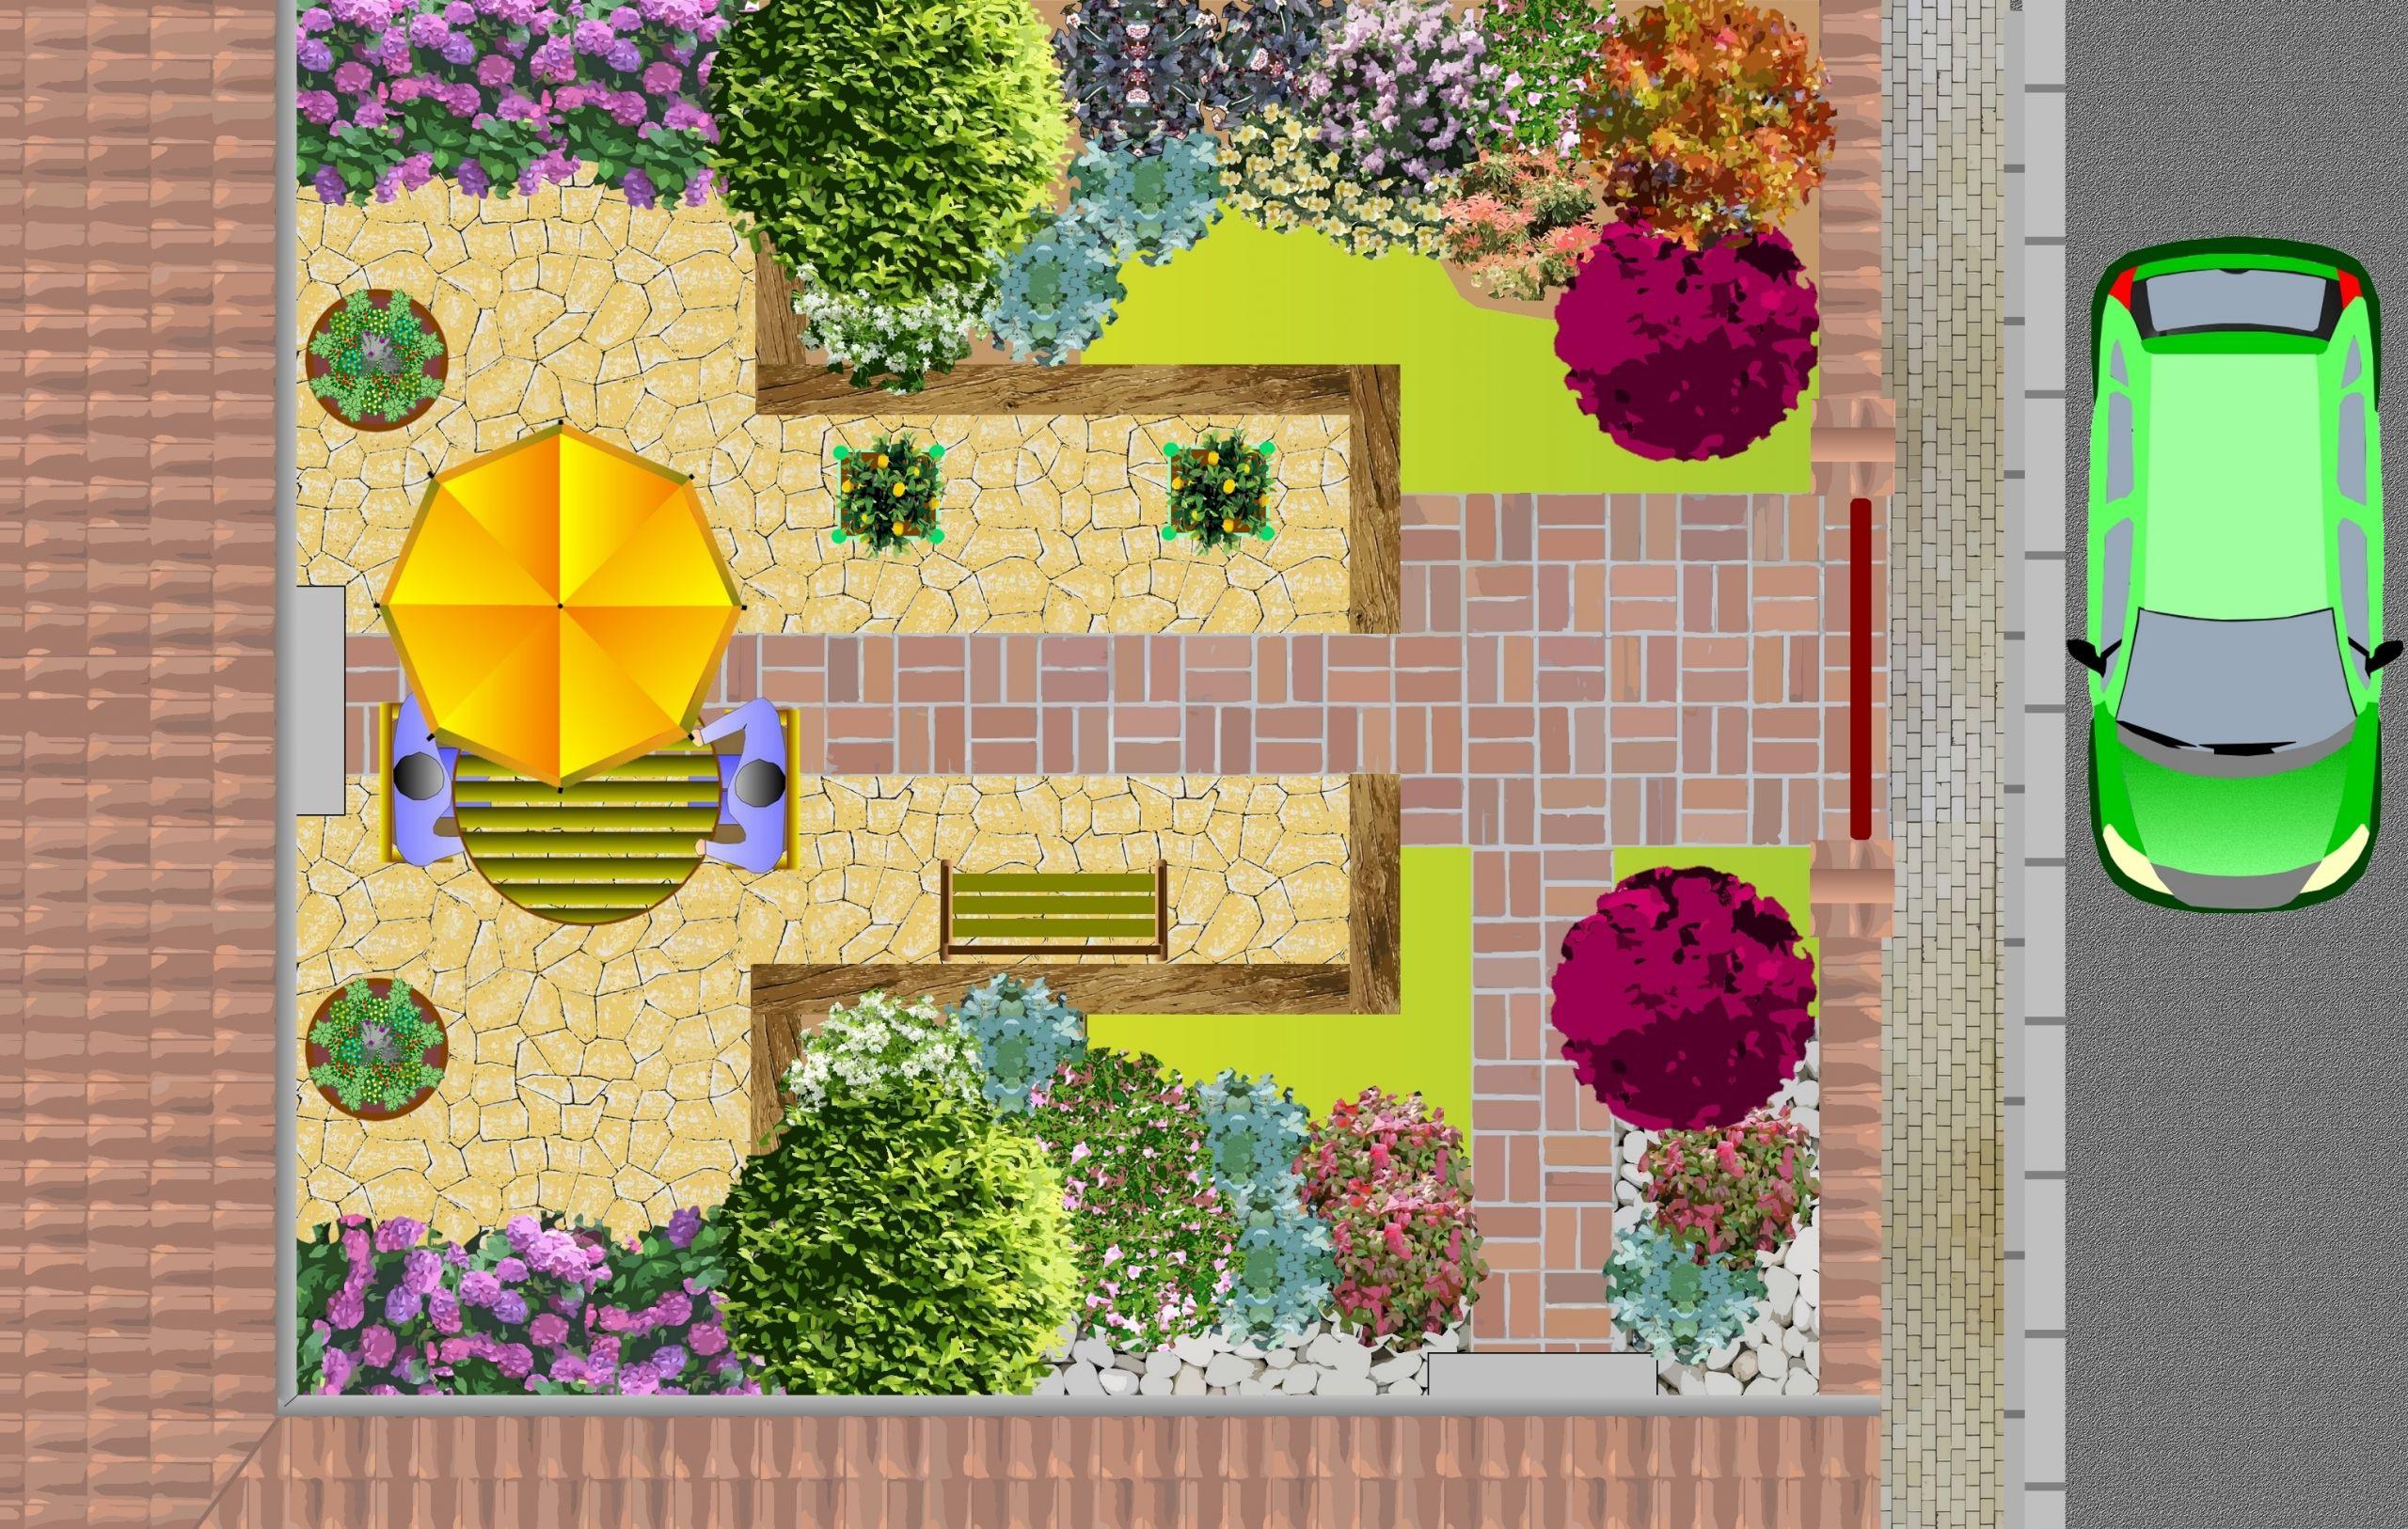 Jardin Paysager Exemple Conception - Idees Conception Jardin intérieur Modèle De Jardin Fleuri